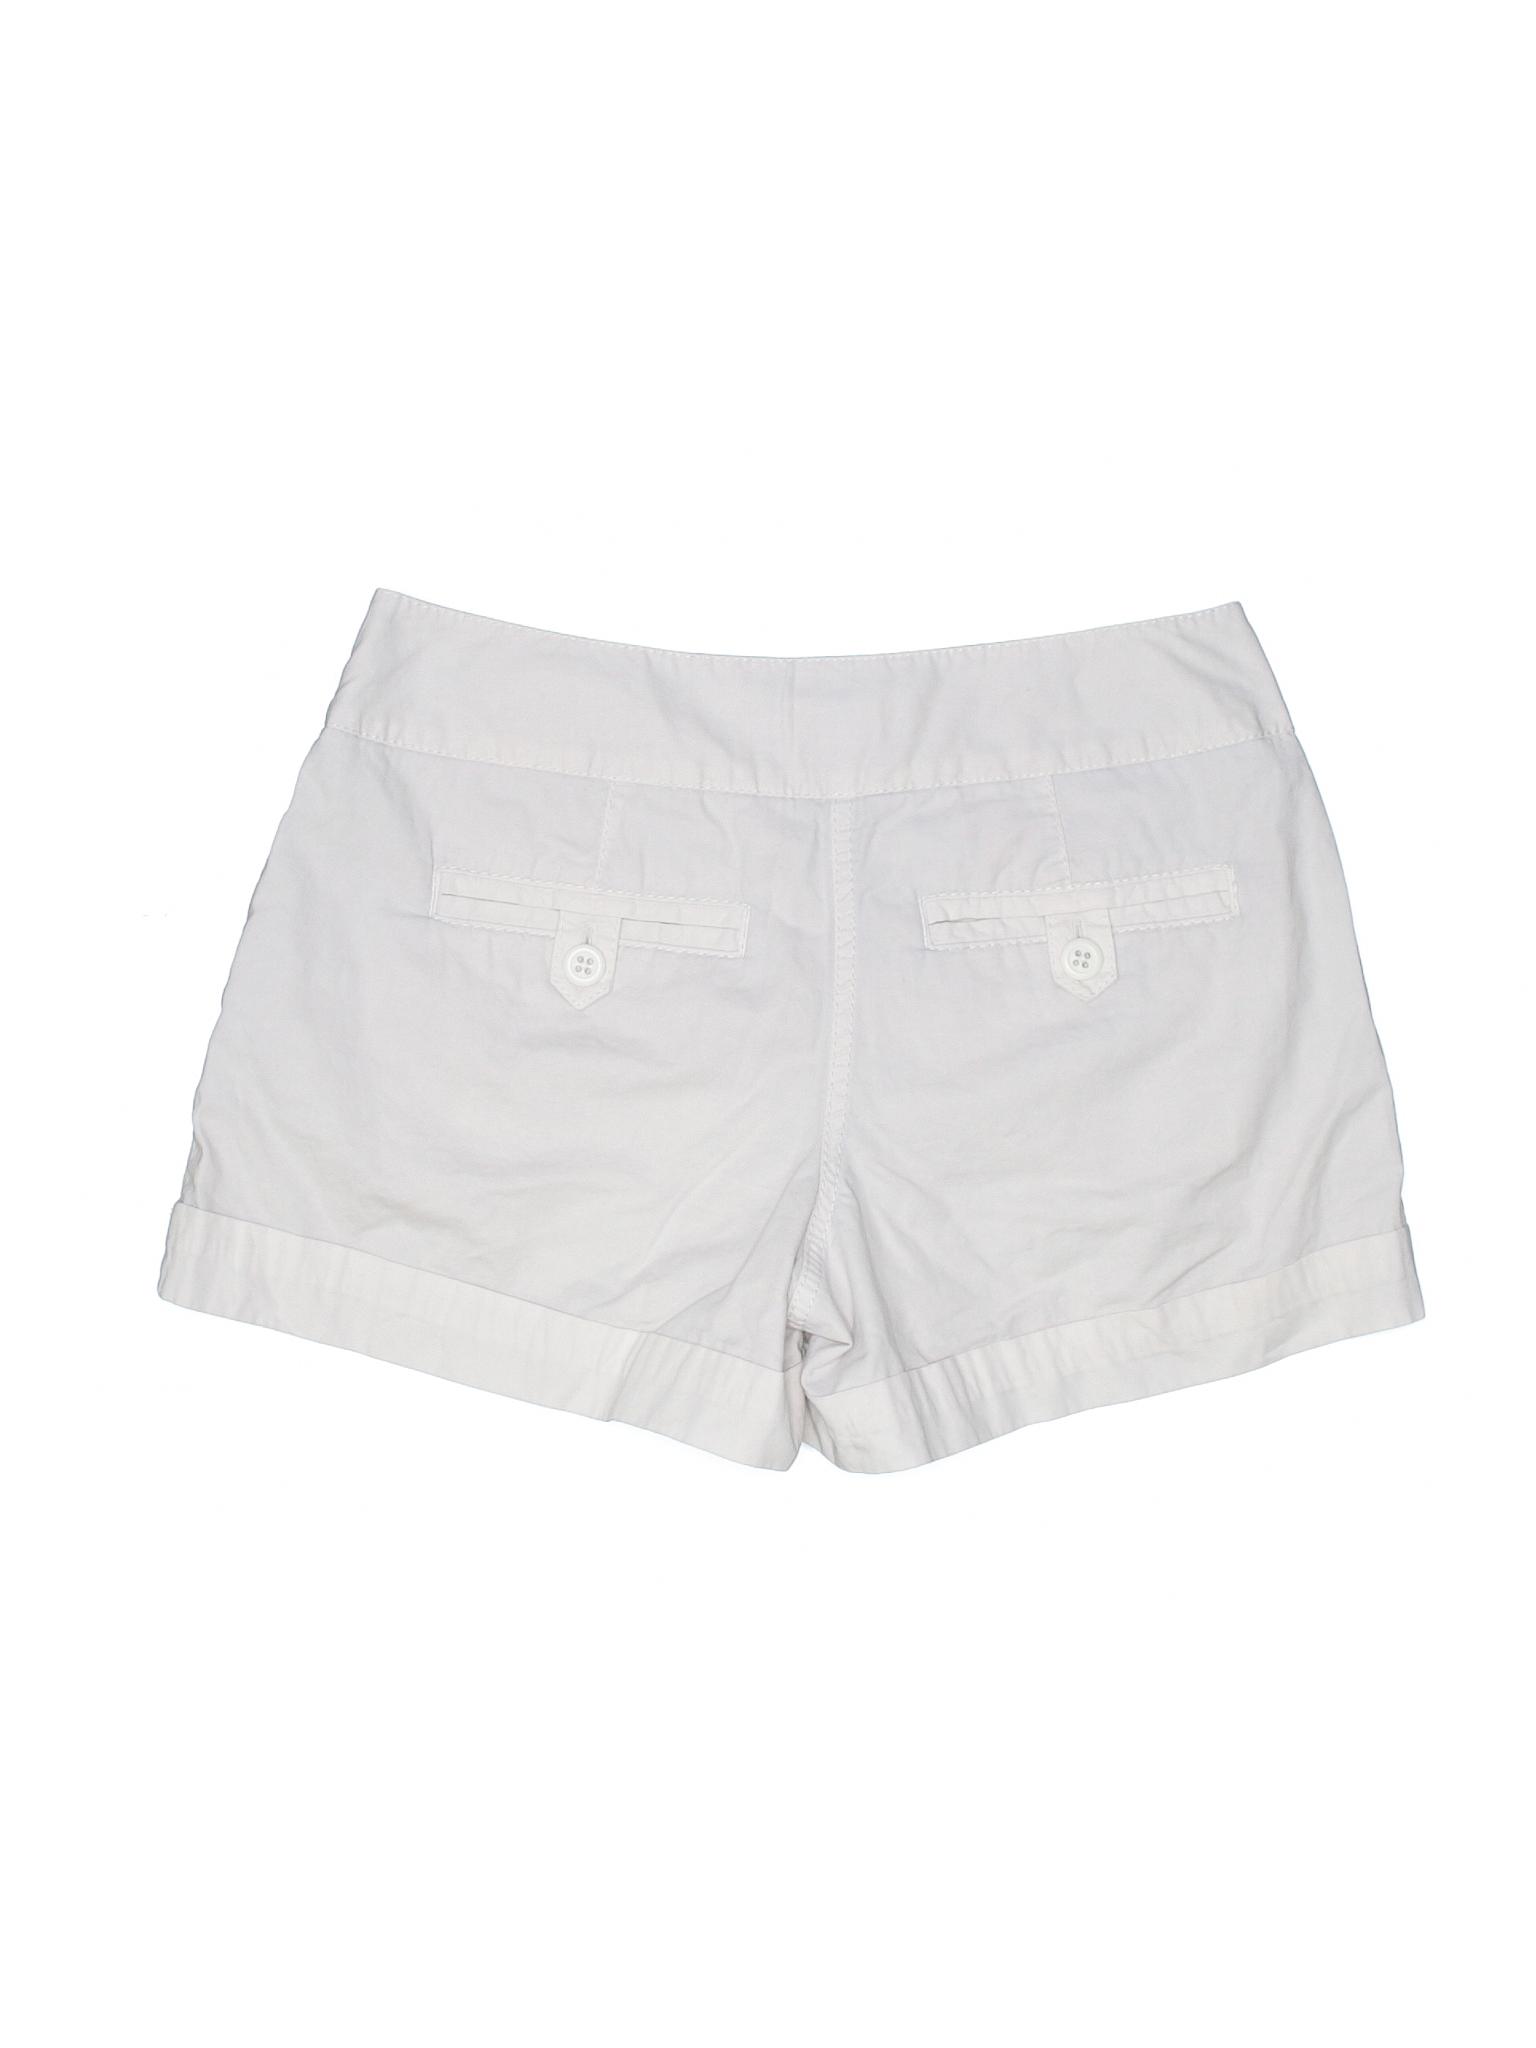 LOFT Taylor Boutique Khaki Ann Shorts qZxw6npU